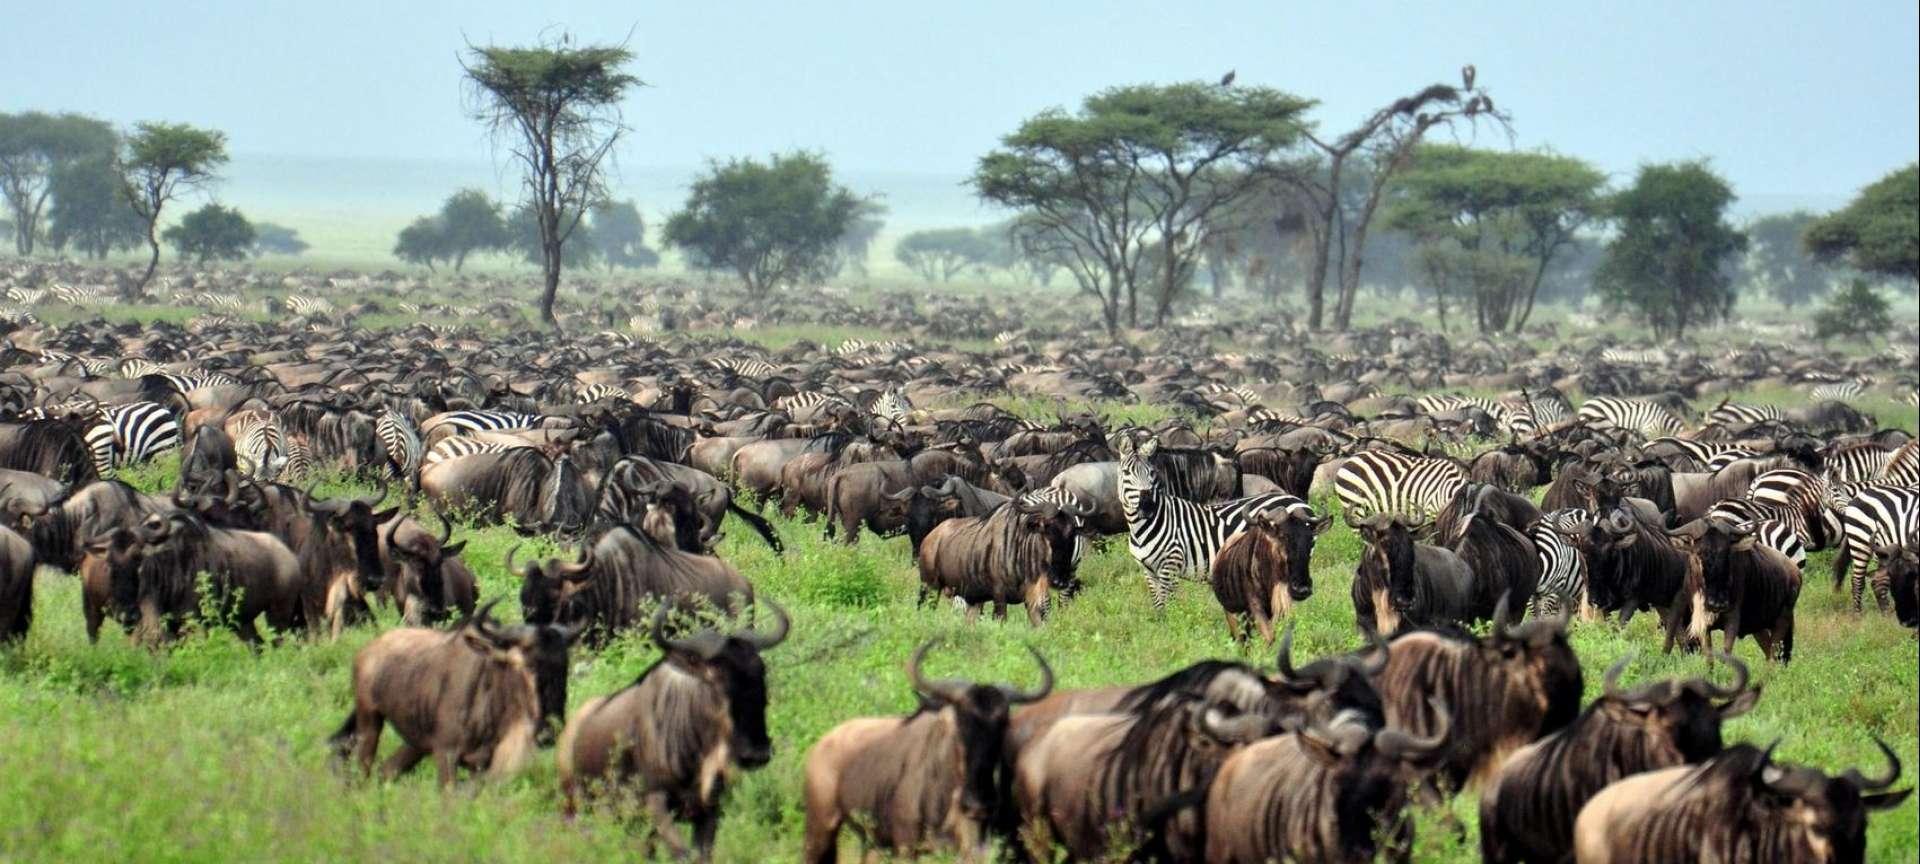 Migration Safari in Tanzania - Africa Wildlife Safaris